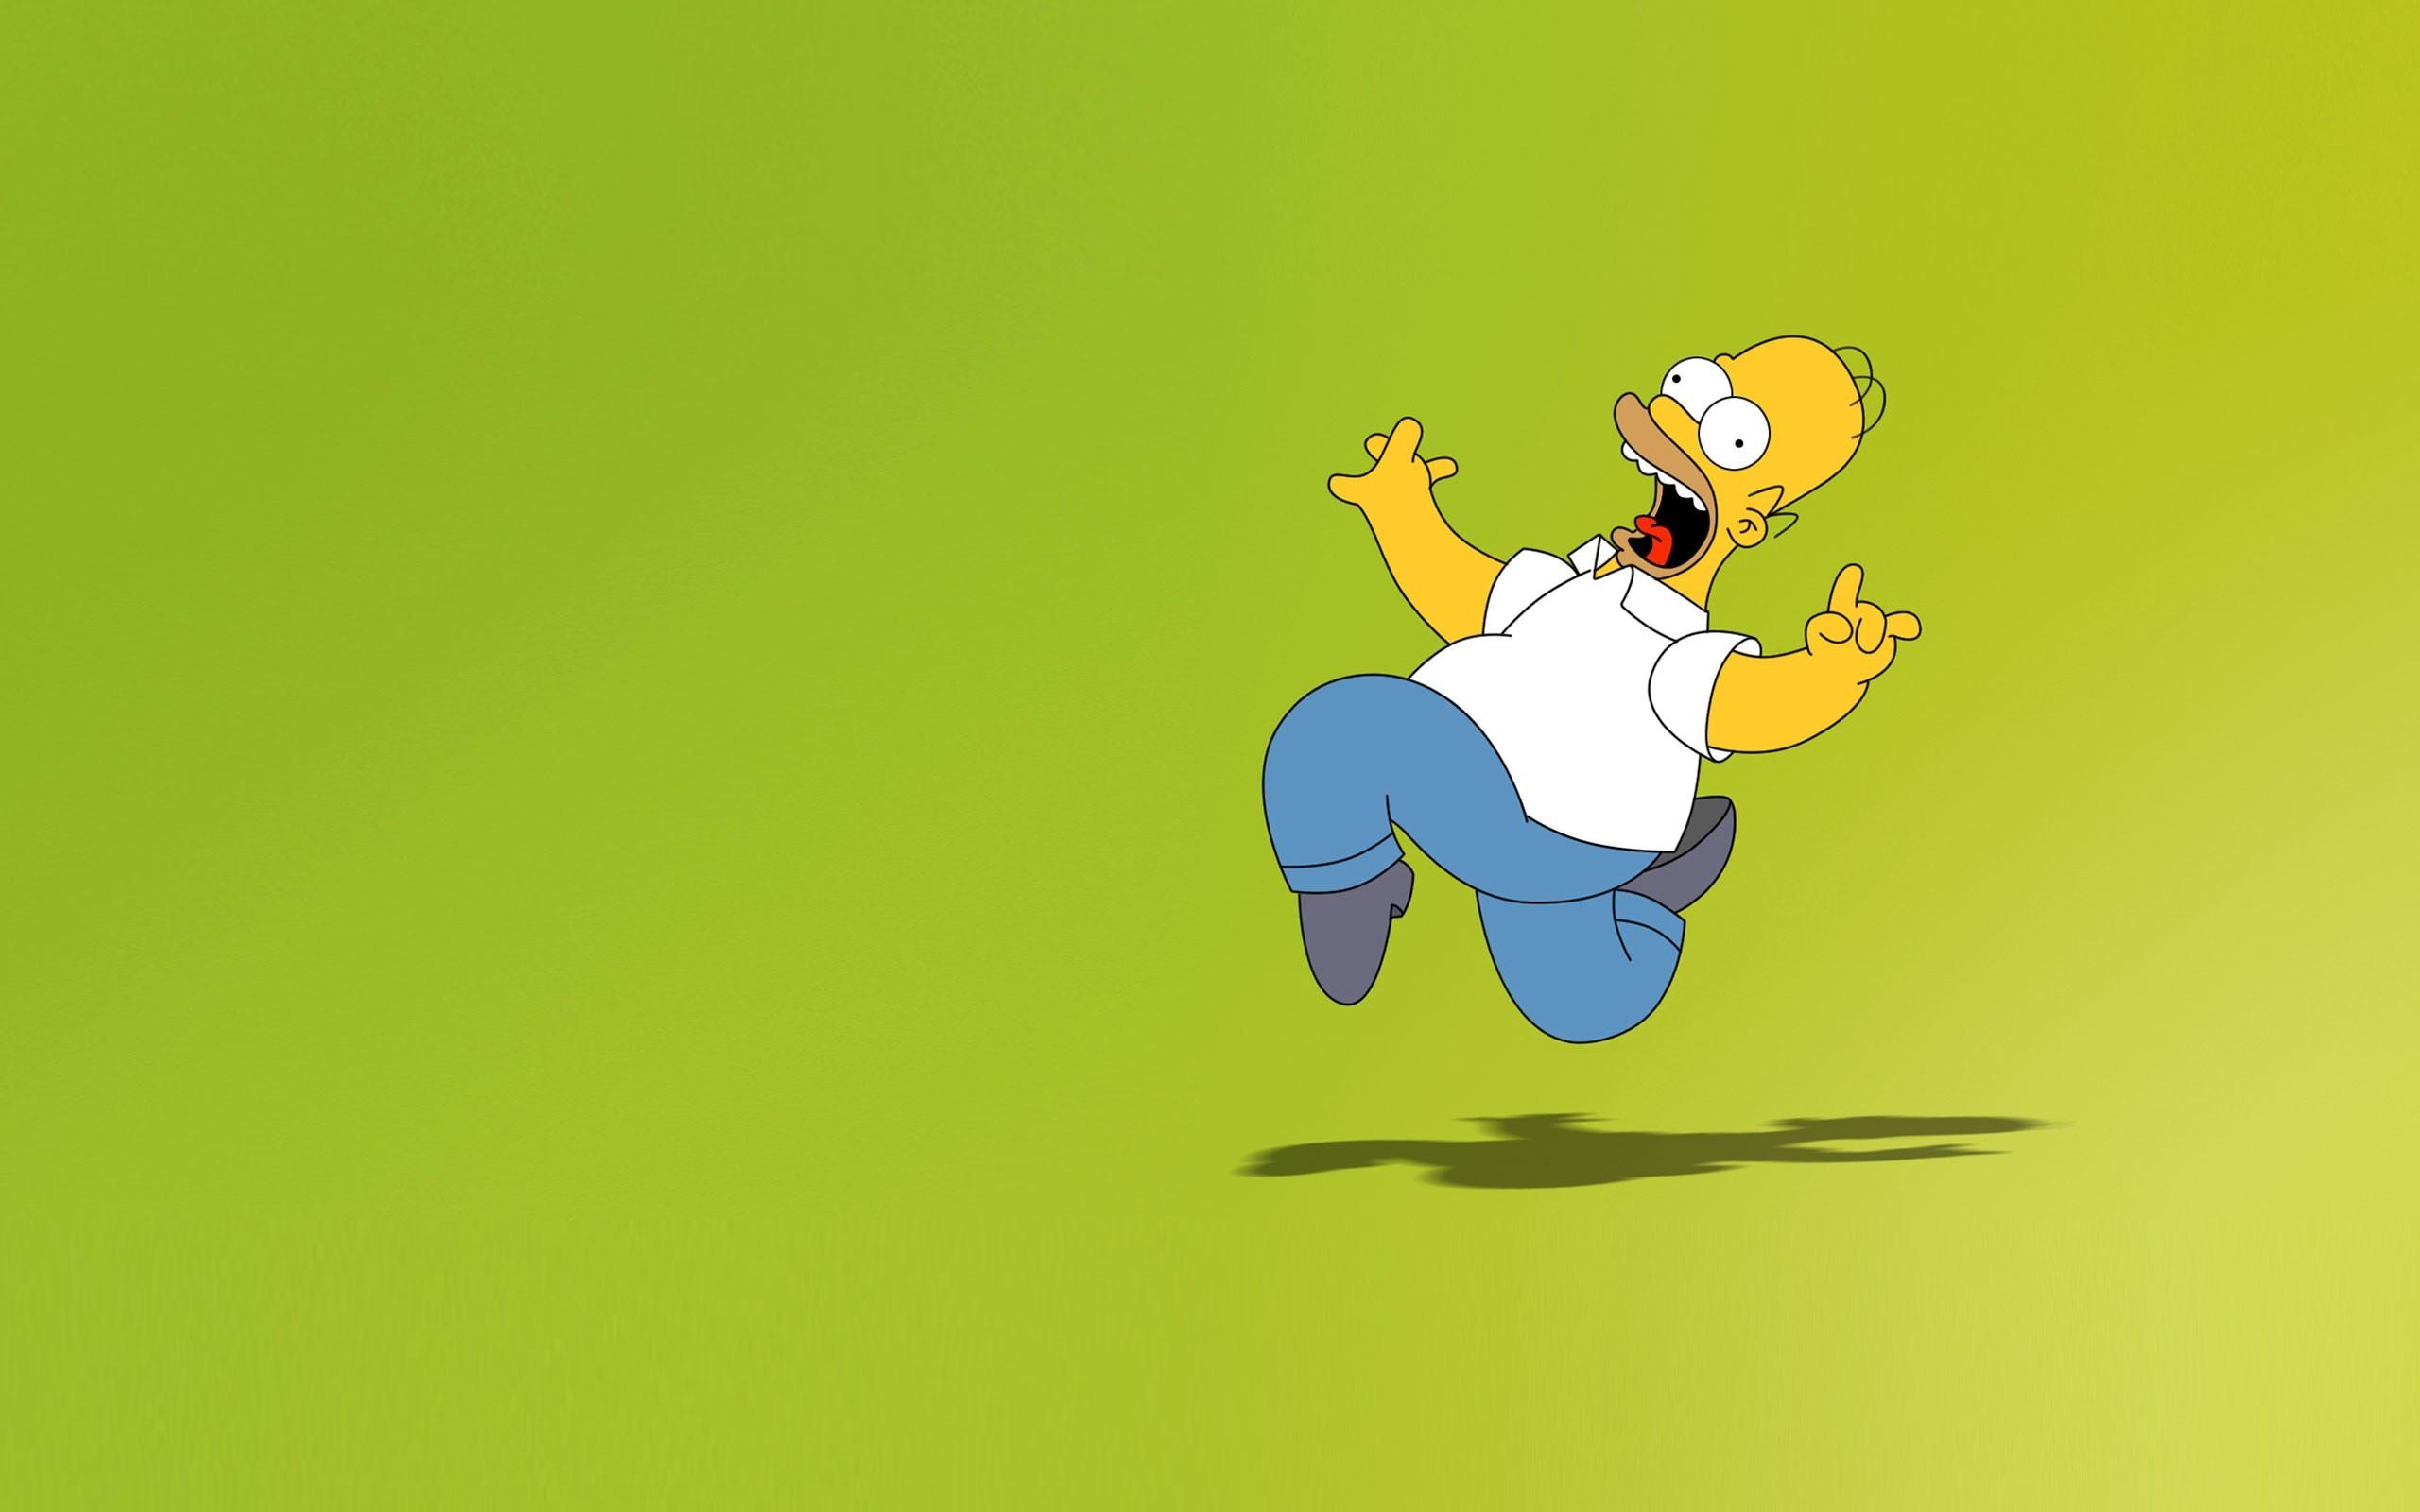 Homer Simpson wallpaper 15277 2560x1600